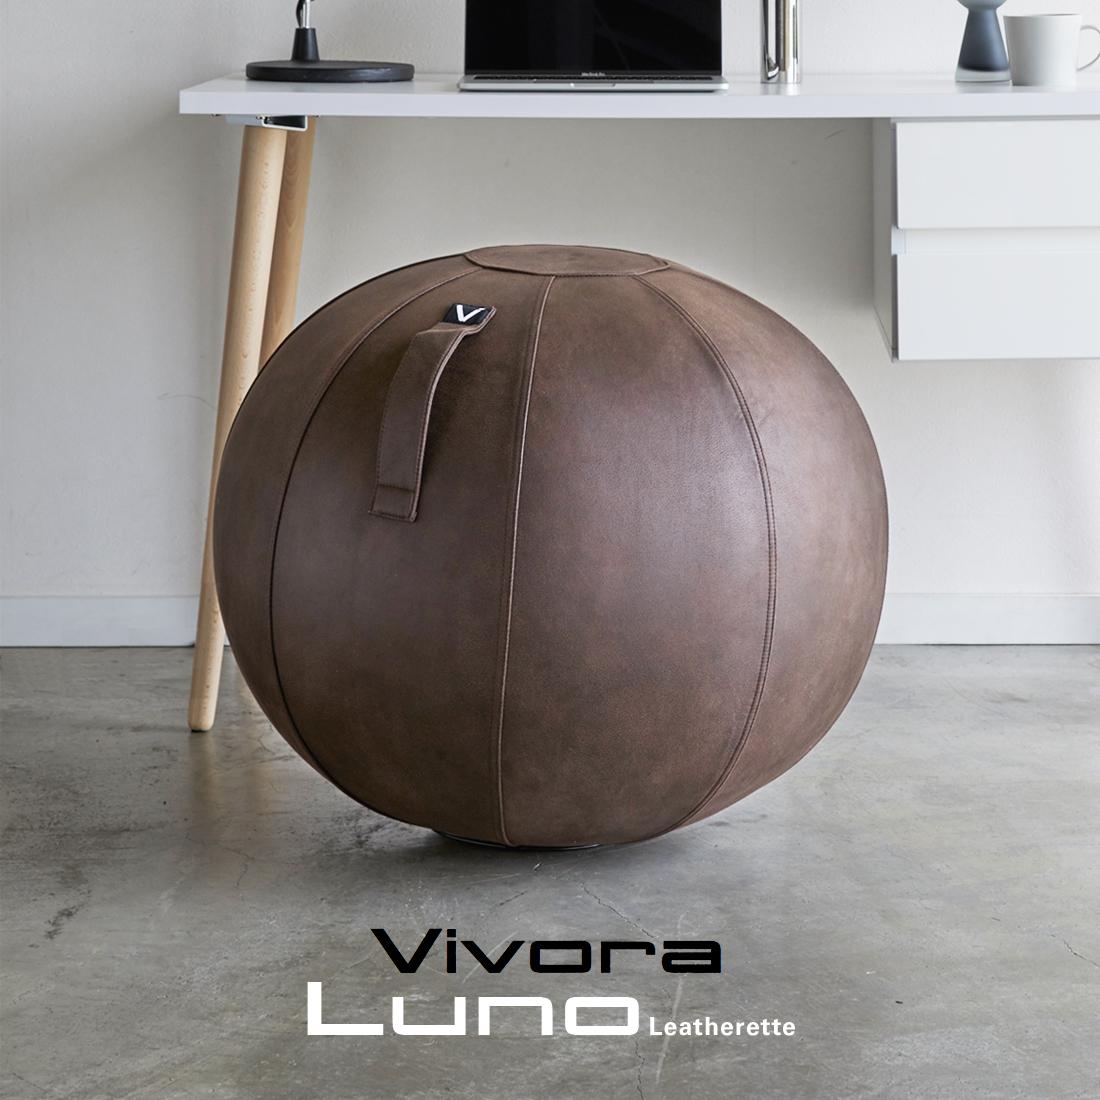 【Vivora ビビオラ】 SITTING BALL CHAIRS LUNO LEATHERETTE シーティングボール ルーノ レザーレット椅子 イス バランスボール クッション ポンプ付き